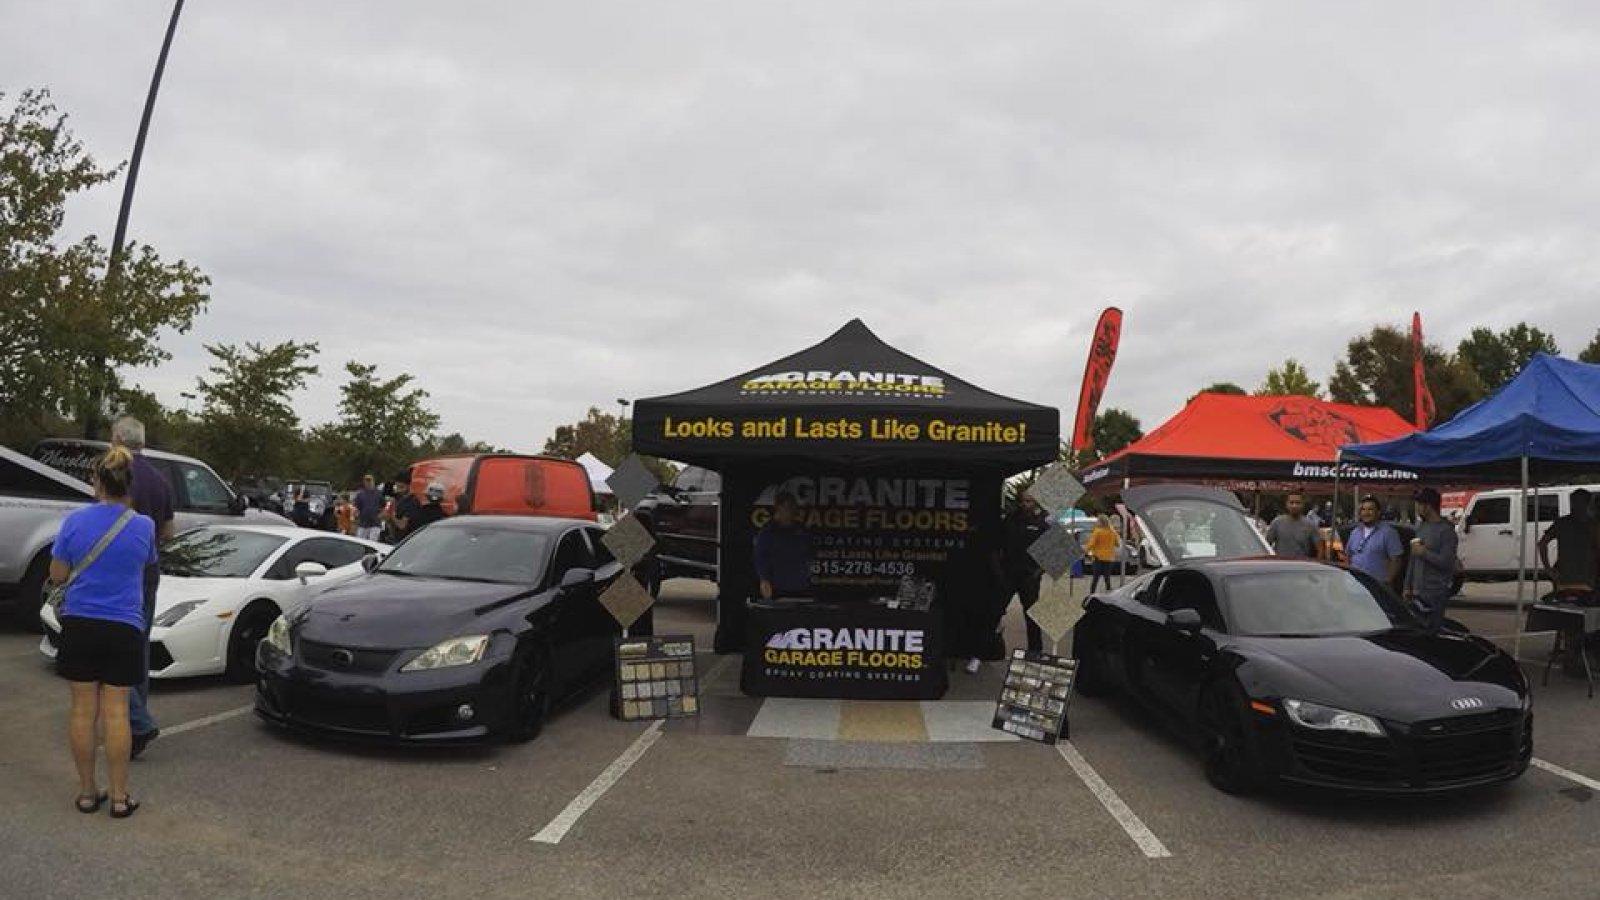 Granite Garage Floors Car show Nashville